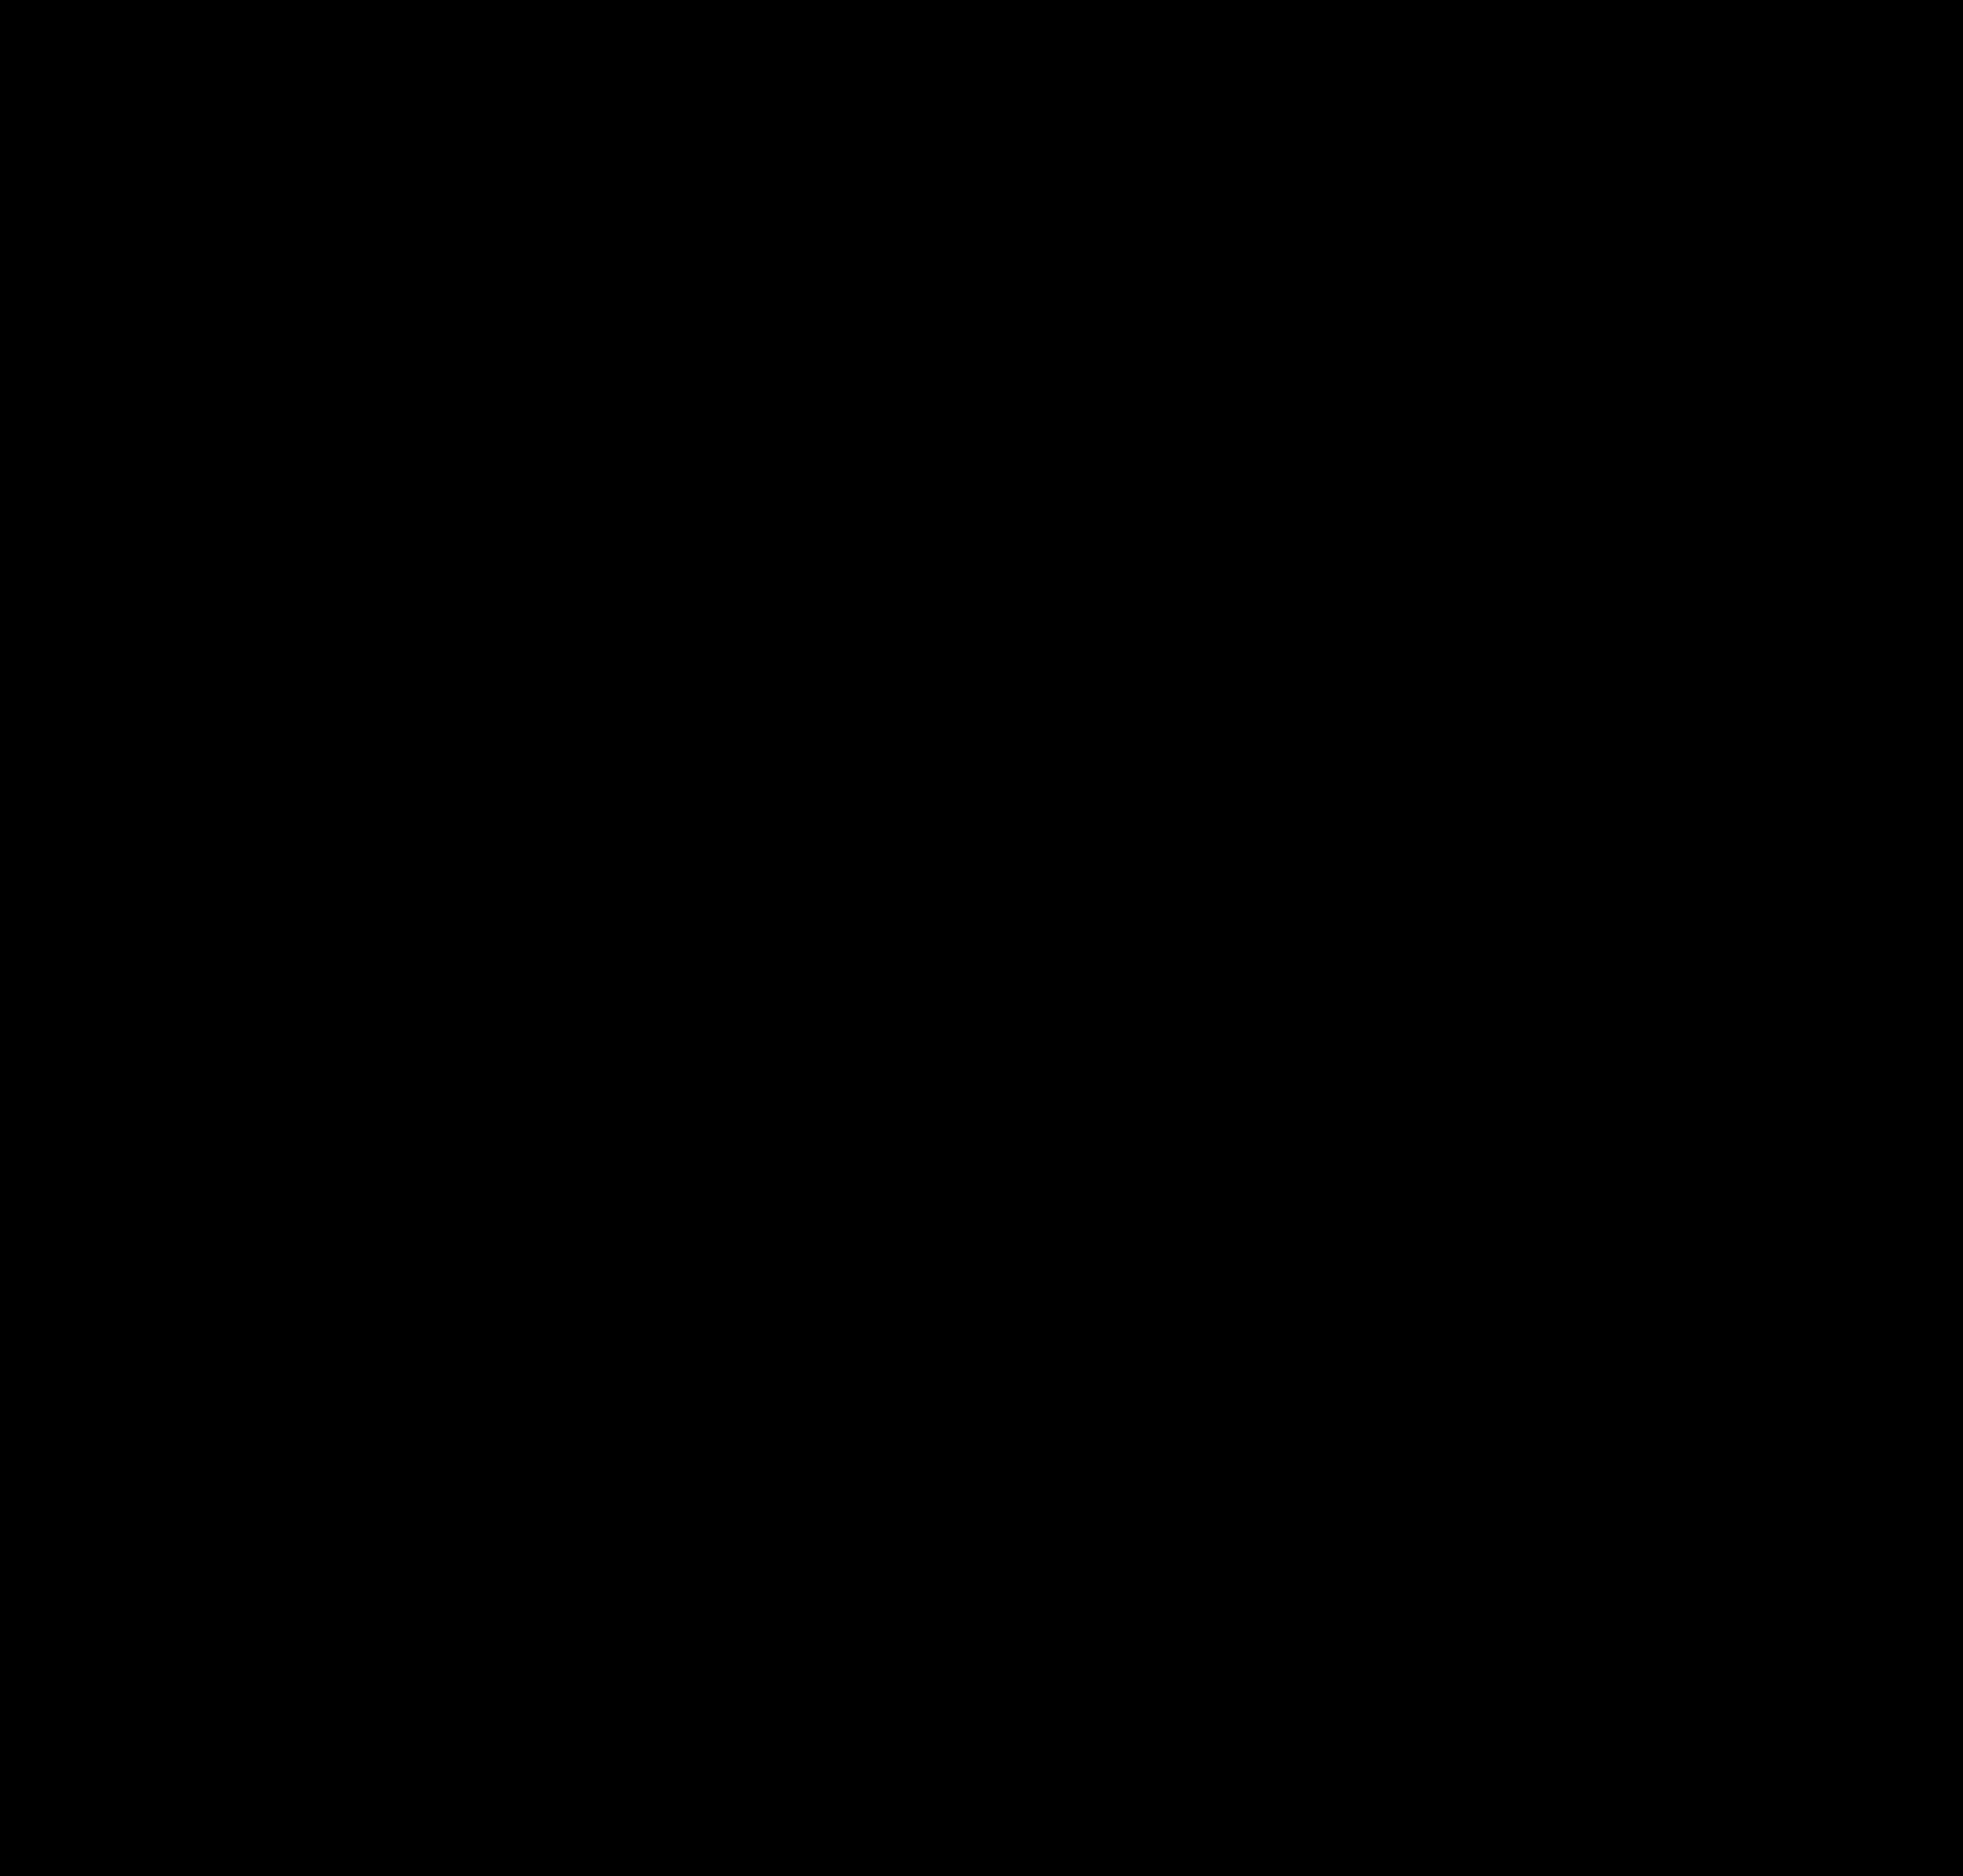 Big image png. Mask clipart symbol